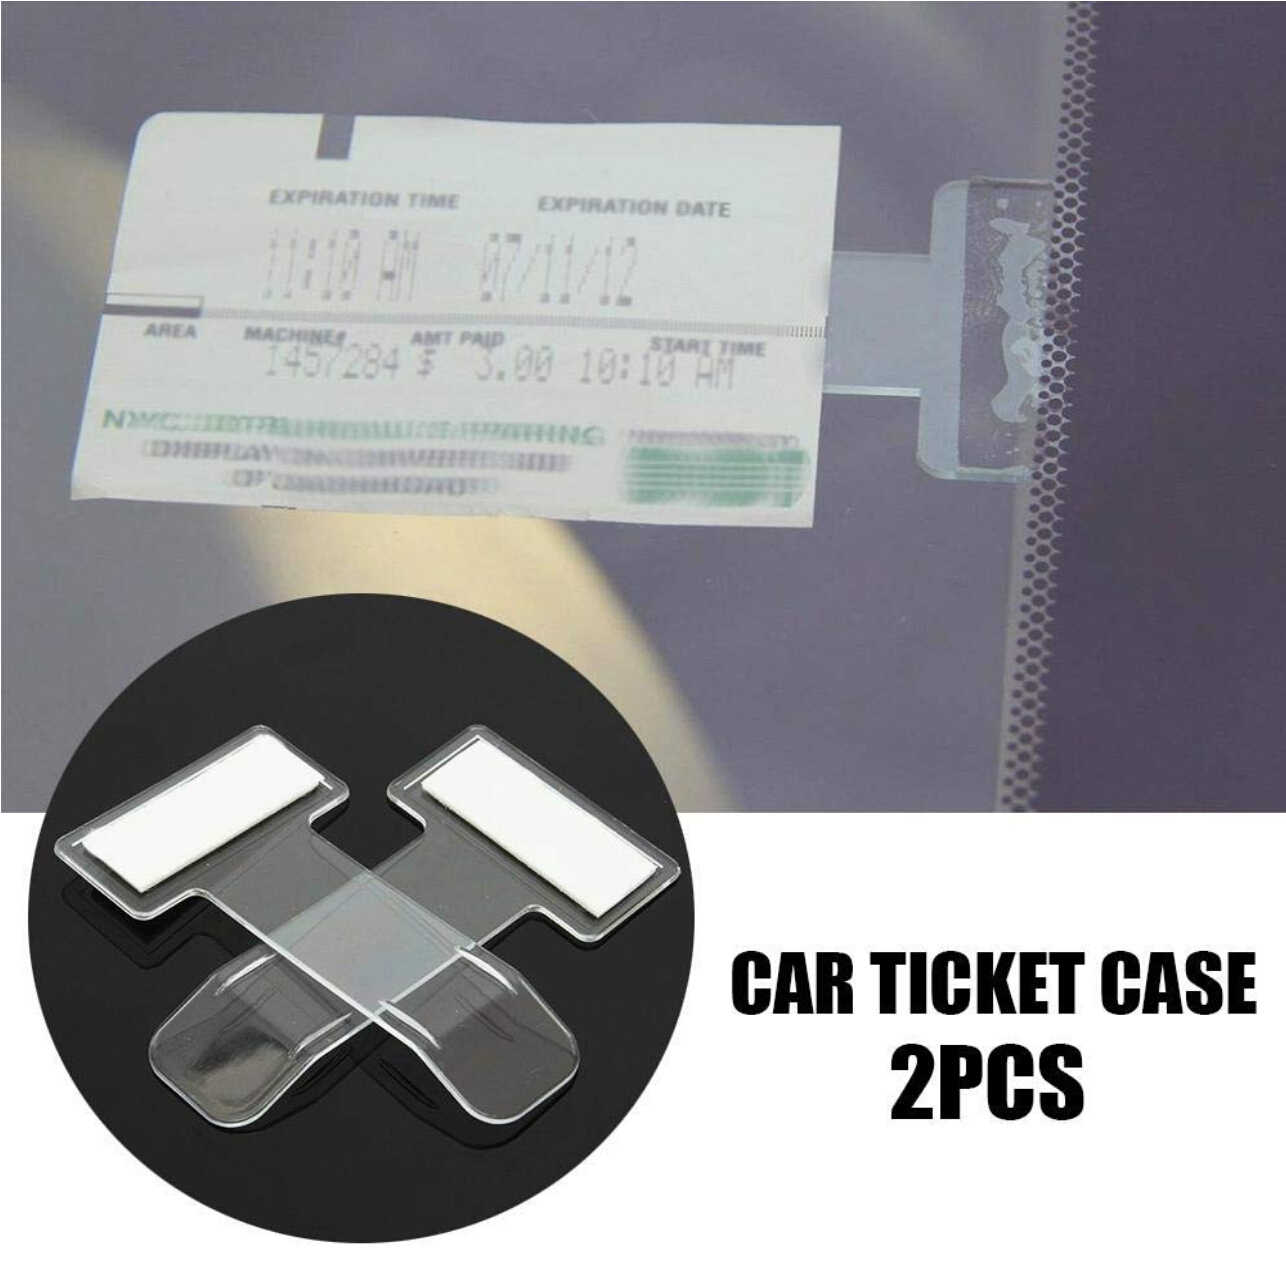 Pince pour Ticket de Parking fibre de carbone pour honda terran opel mokka mazda 6 2006 alfa romeo 159 renault megane 2